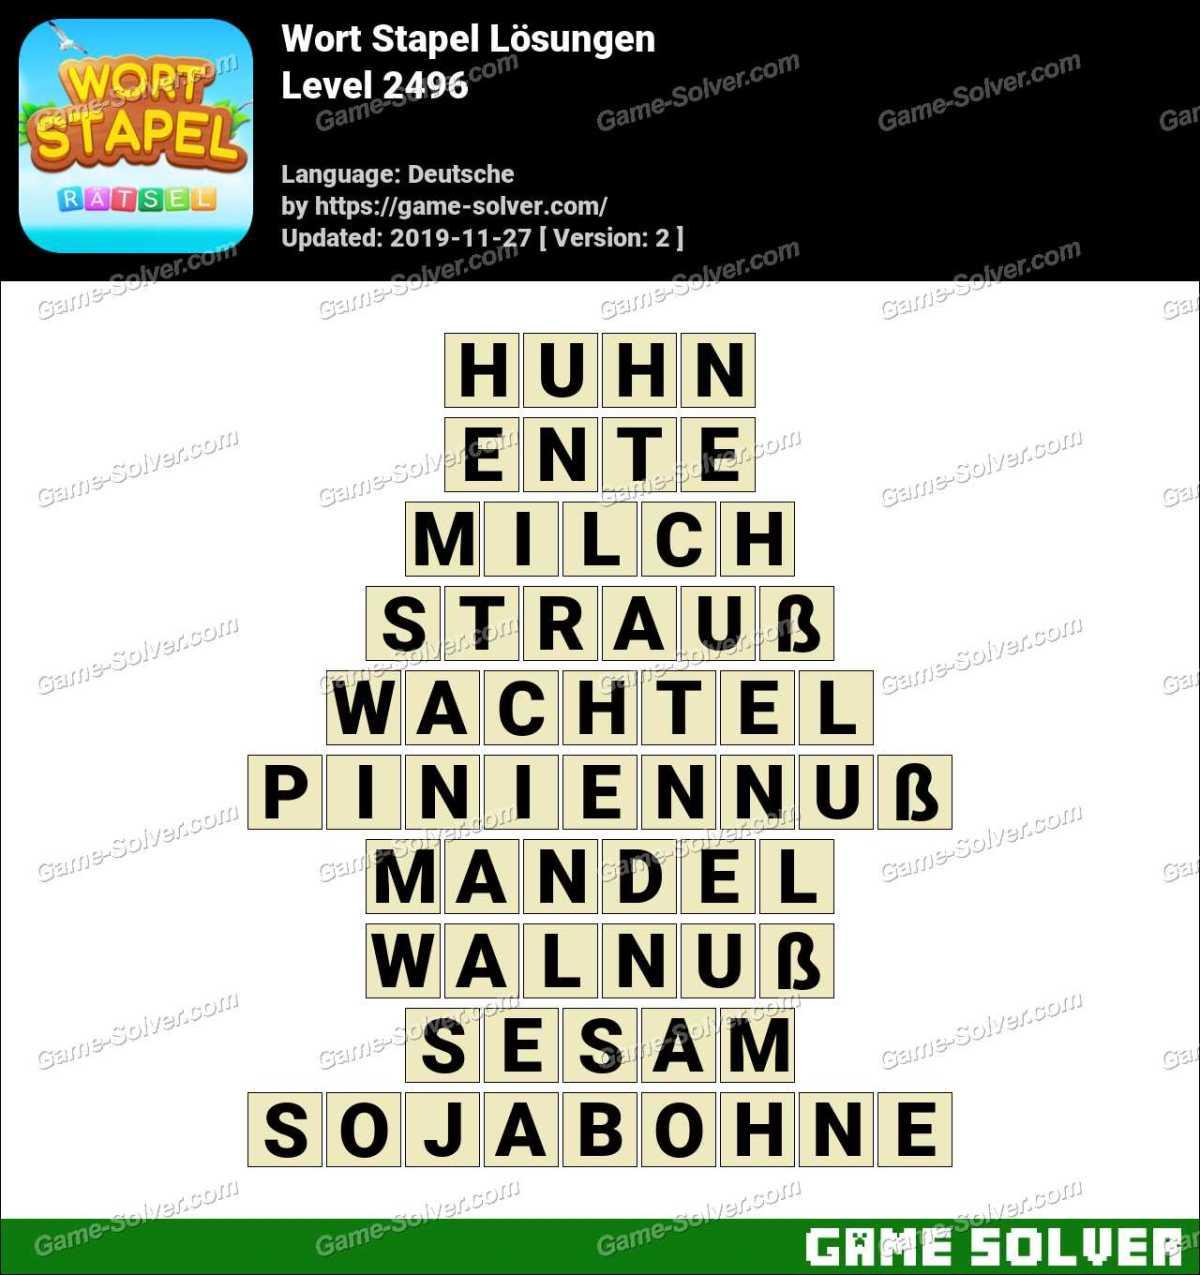 Wort Stapel Level 2496 Lösungen